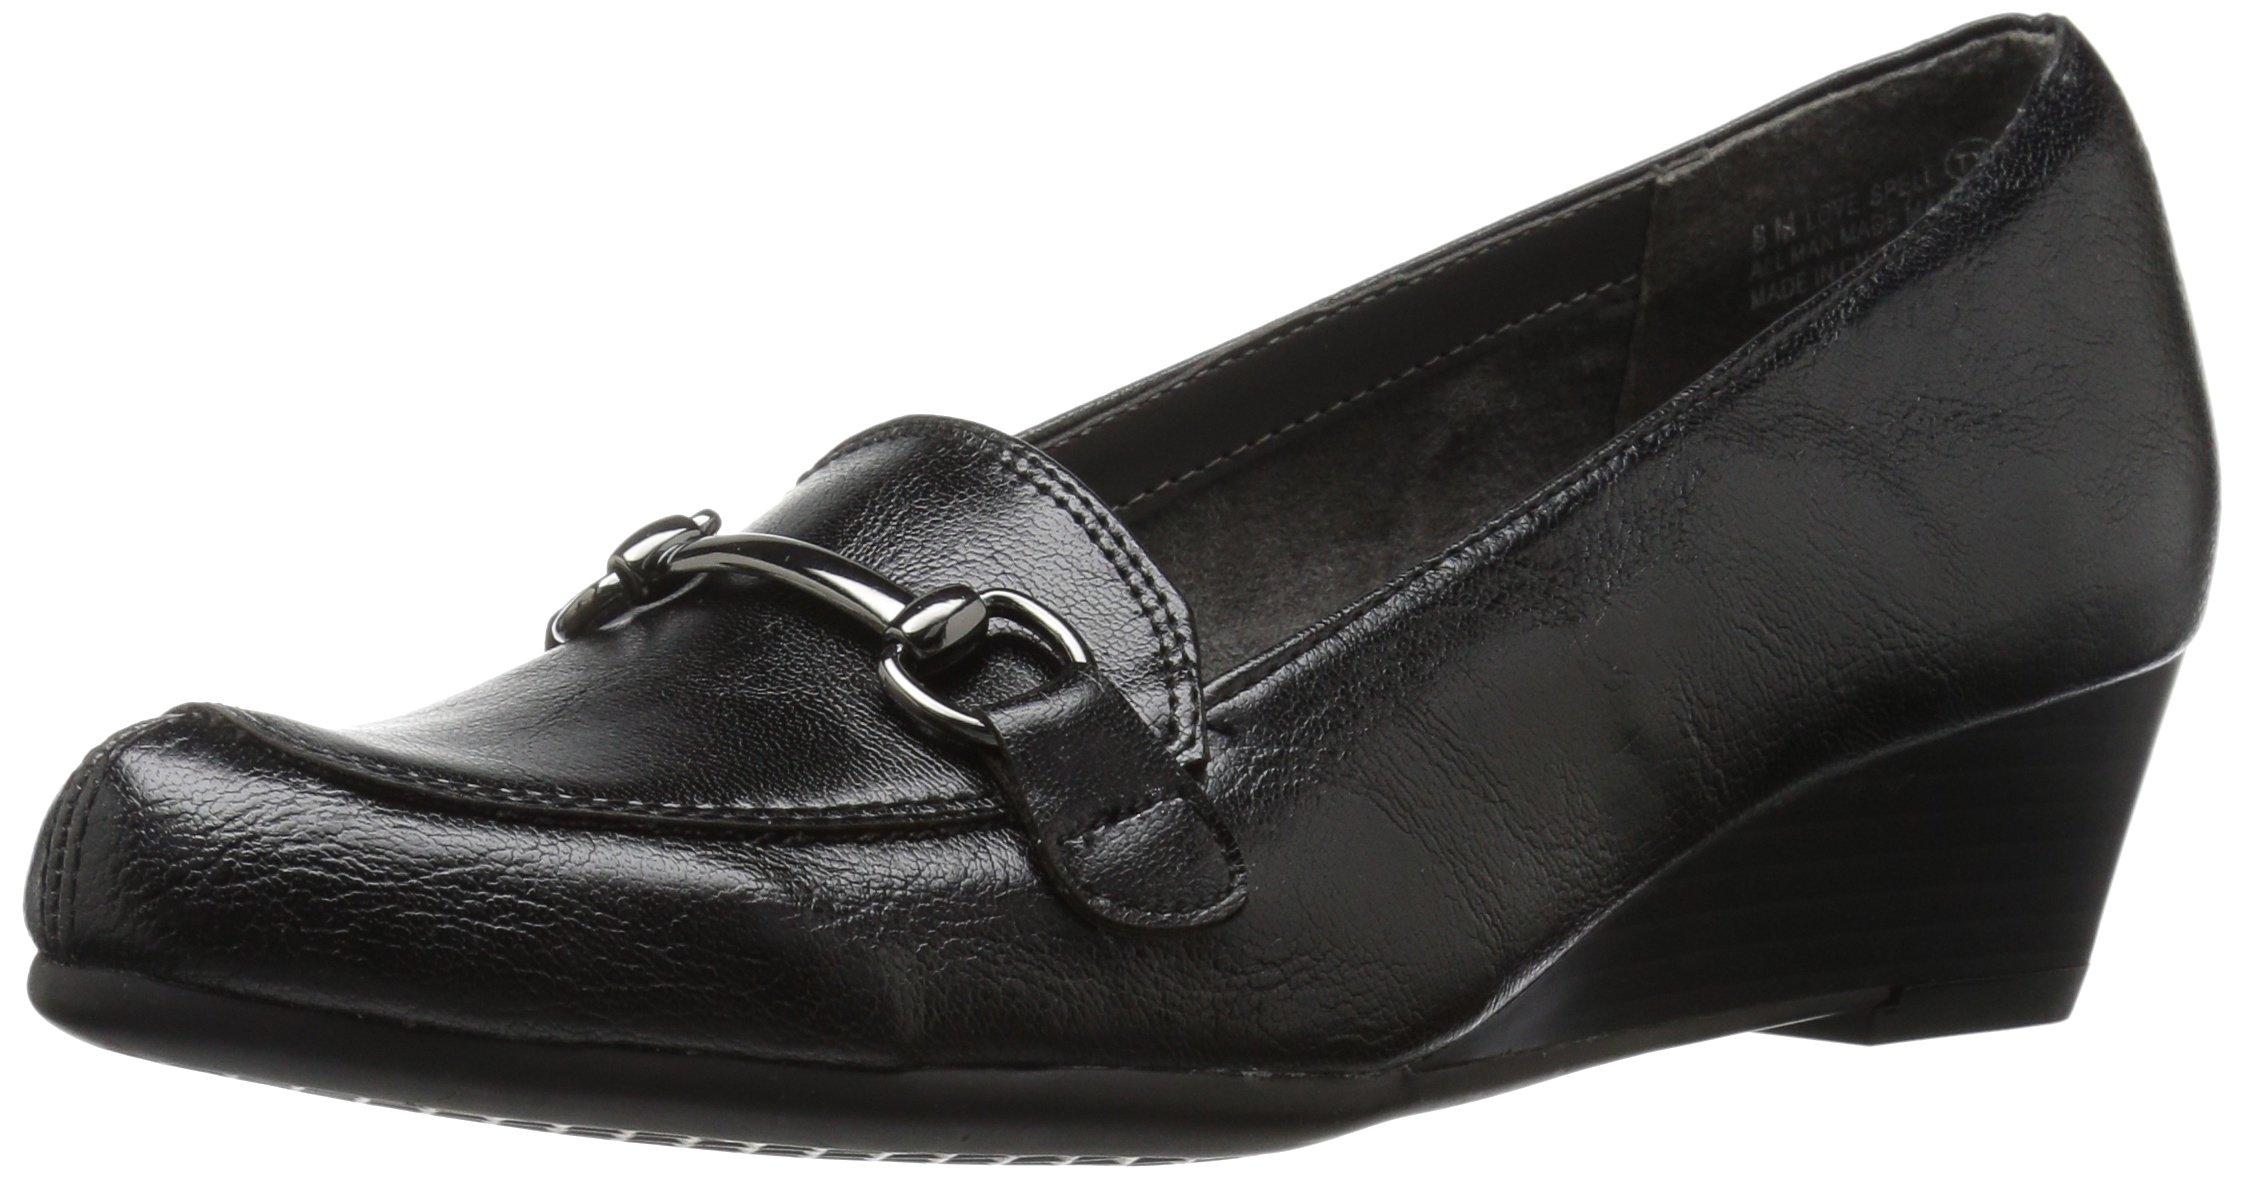 Aerosoles A2 by Women's Love Spell Slip-on Loafer, Black, 8 M US by Aerosoles (Image #1)